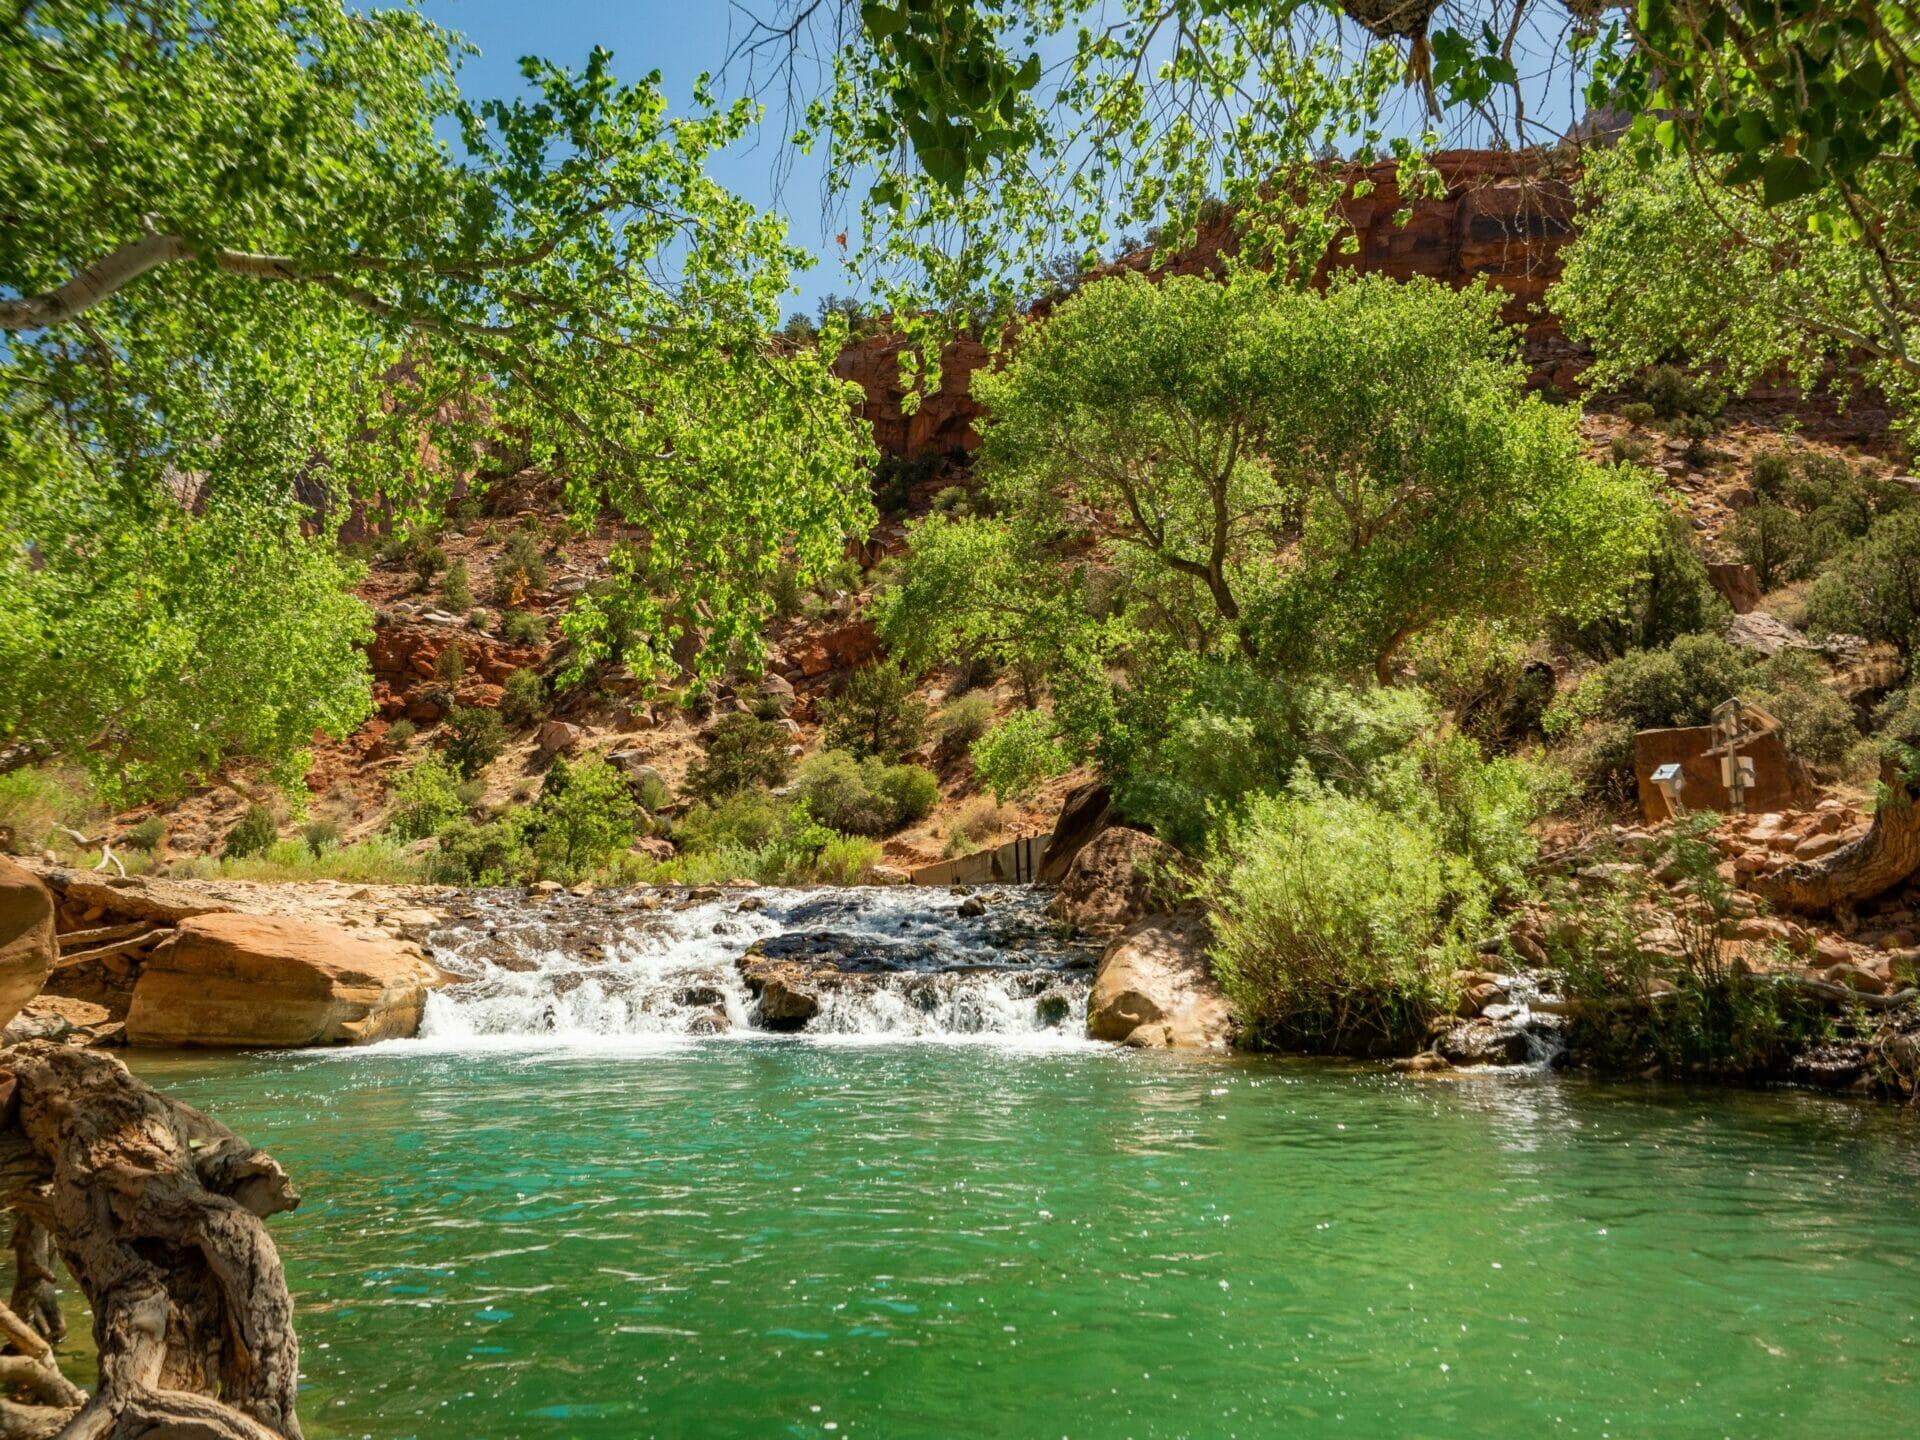 Zion National Park itinerary best hikes biking Zion Canyon